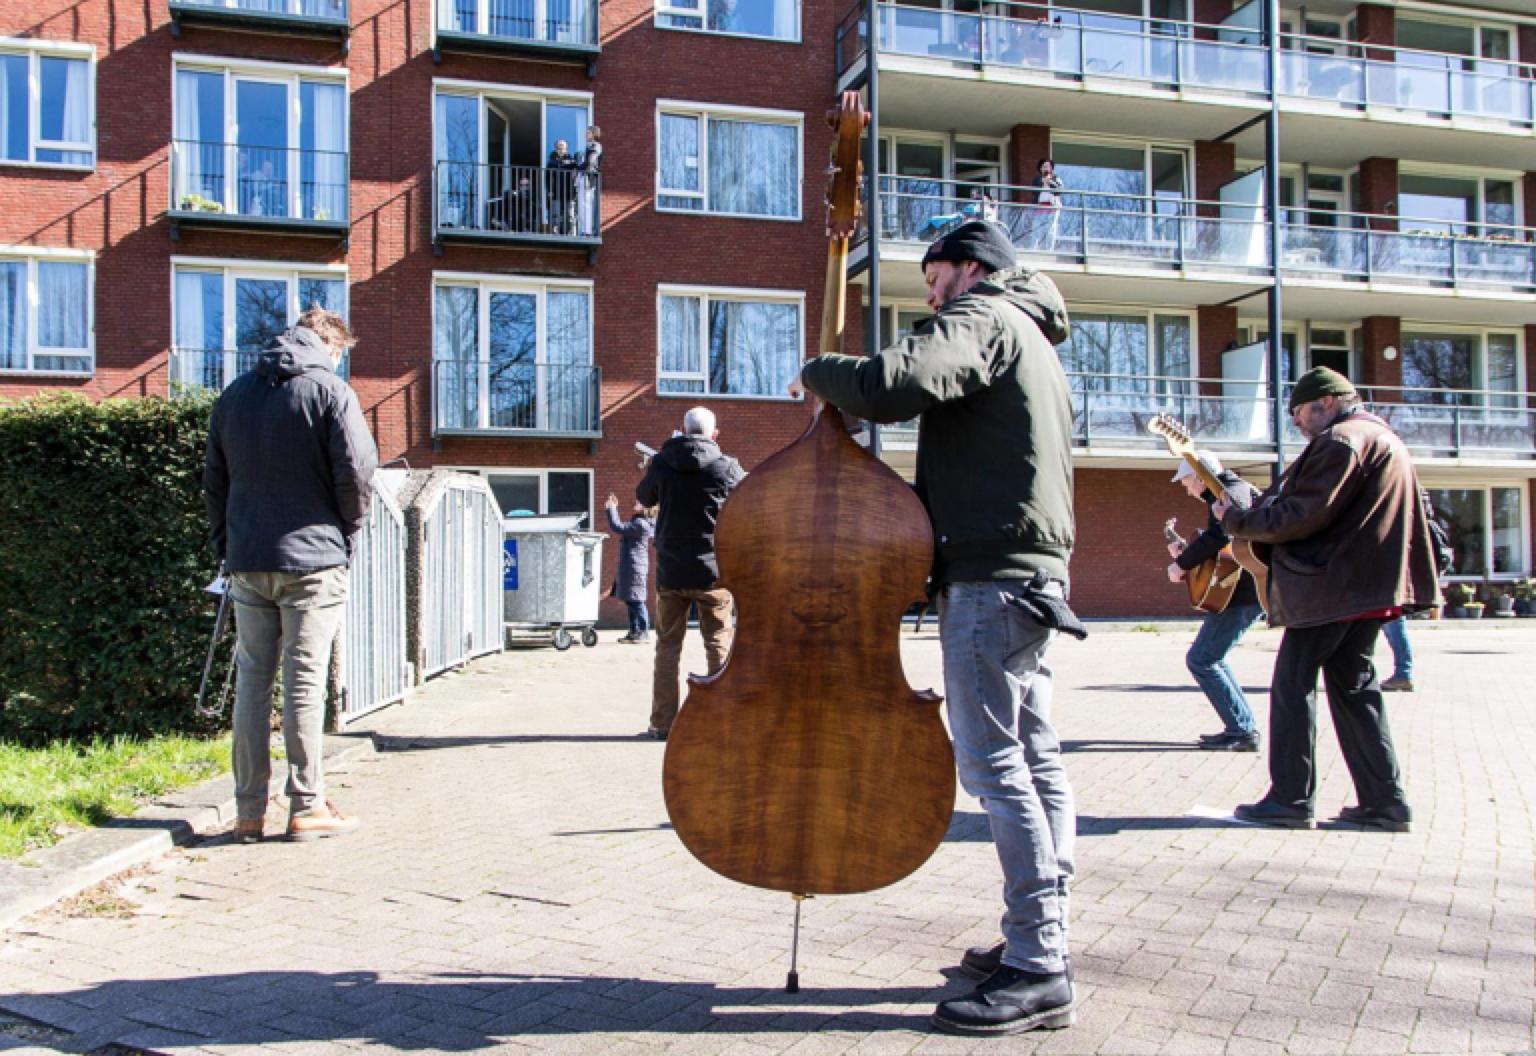 De Kift brengt serenade aan bewoners verpleeghuis Rosariumhorst in Krommenie [video]